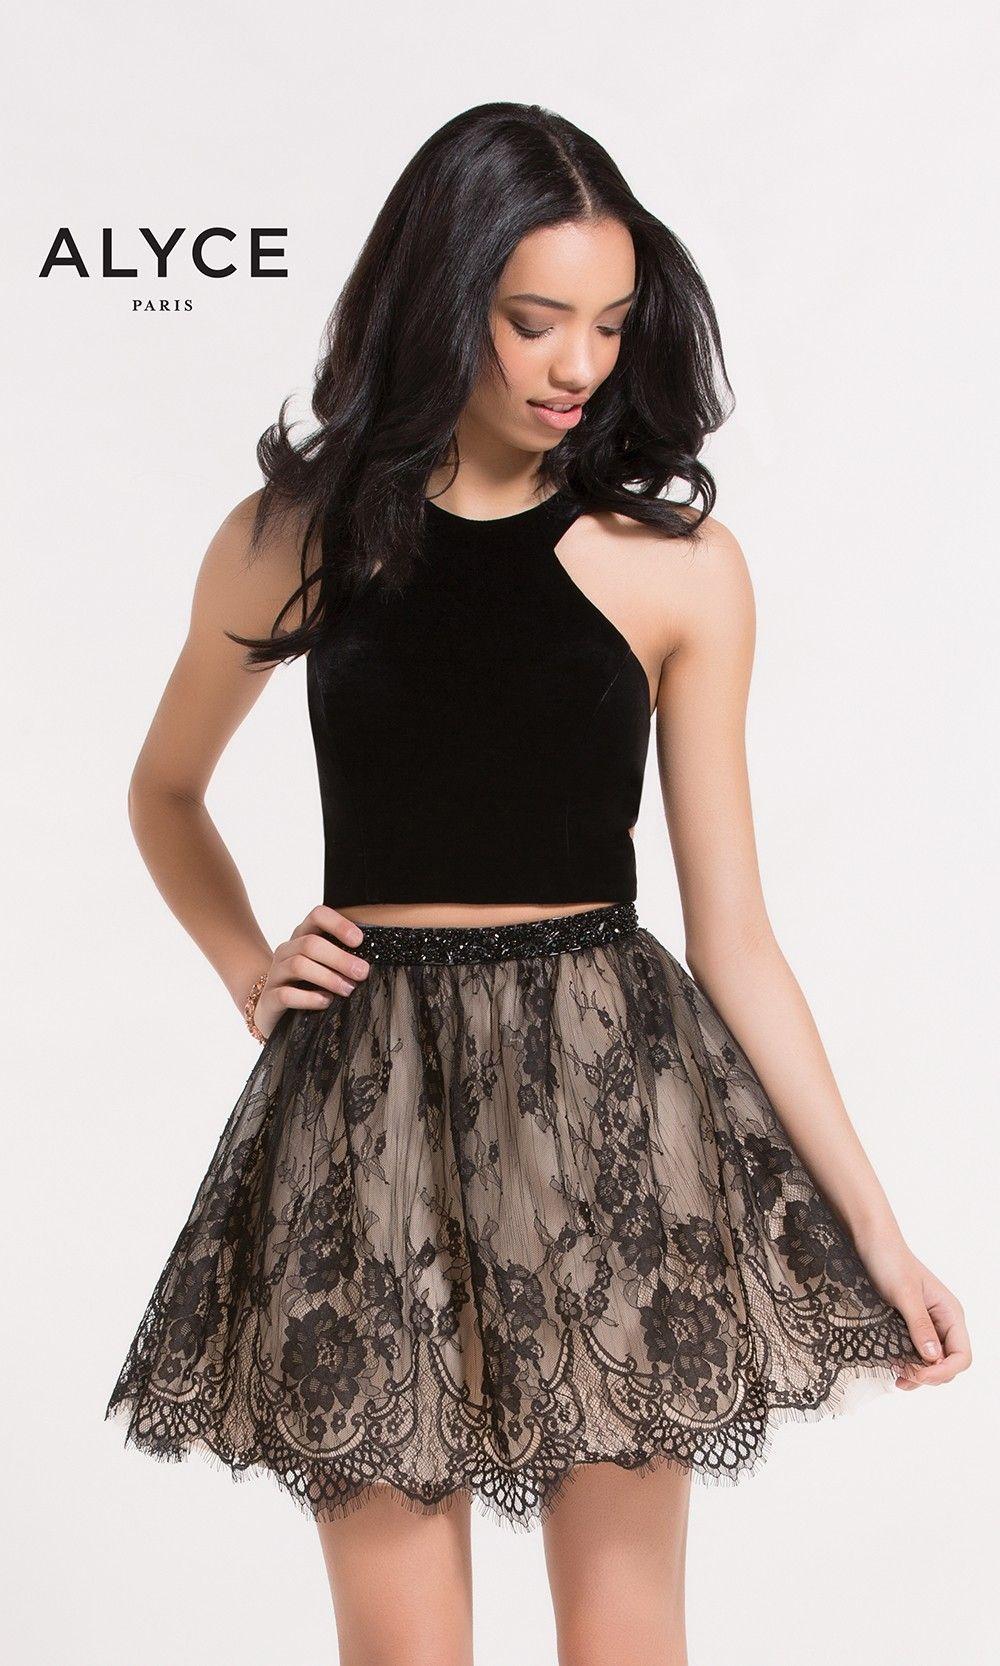 alyce paris kalani ballet collection | dress style 2646 | alyce